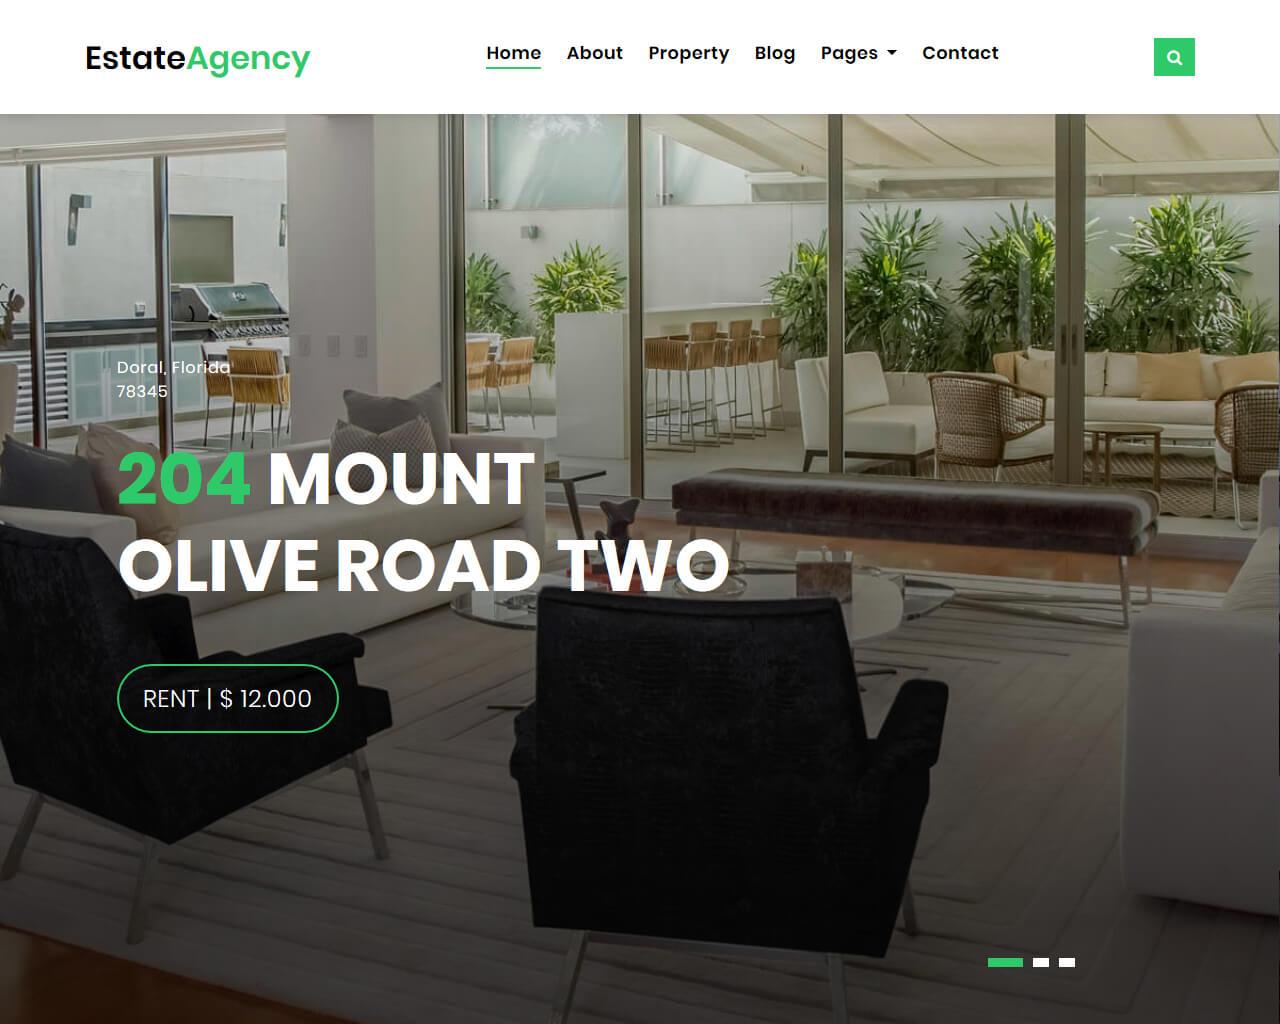 EstateAgency – Free Real Estate Website Template